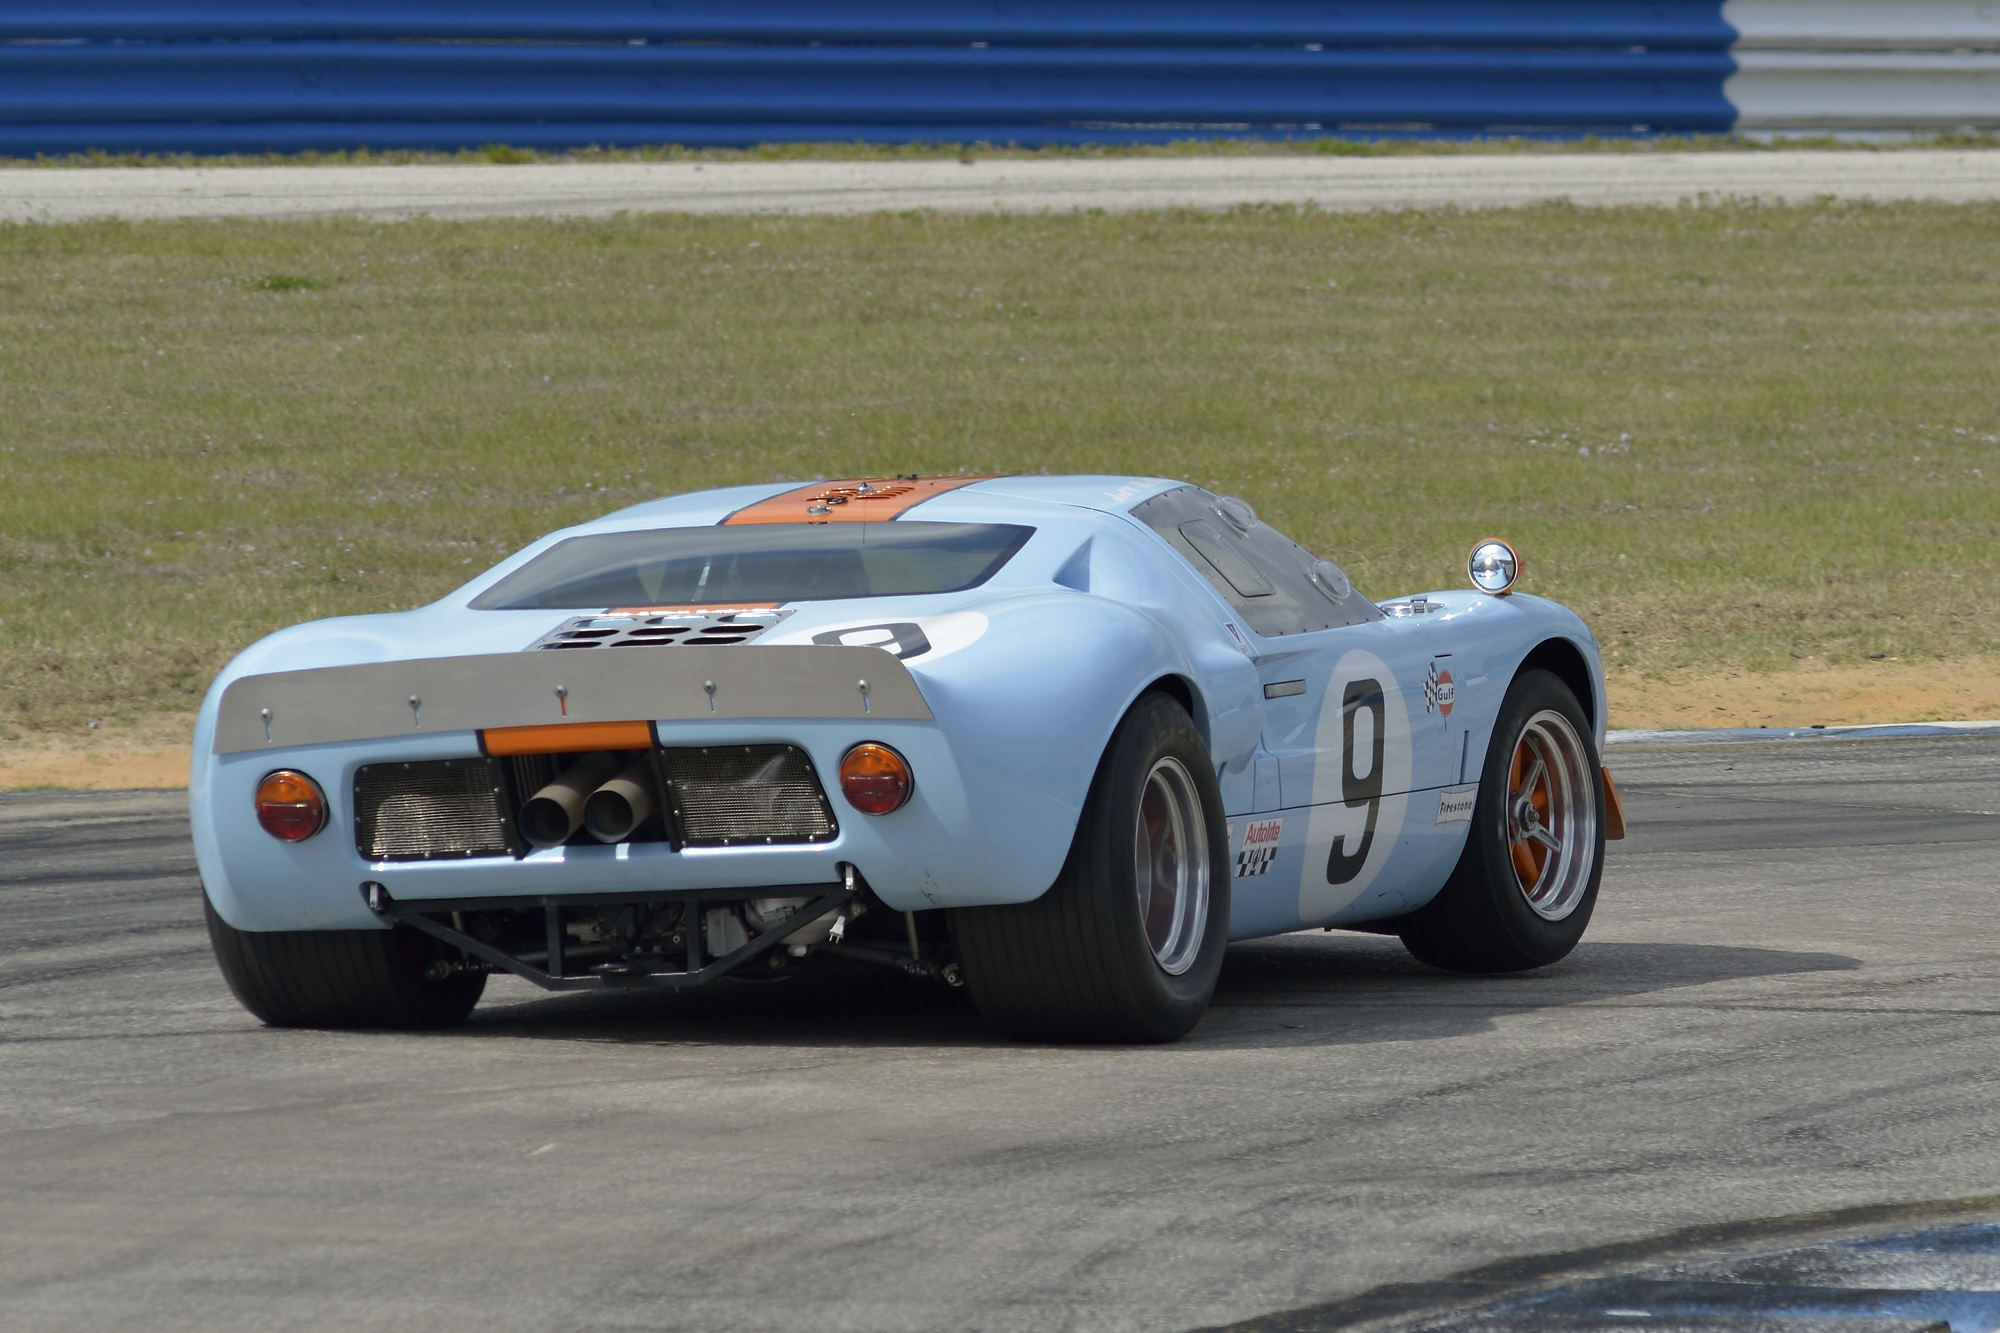 Robert Blain - 1967 Lola T 70 Spyder